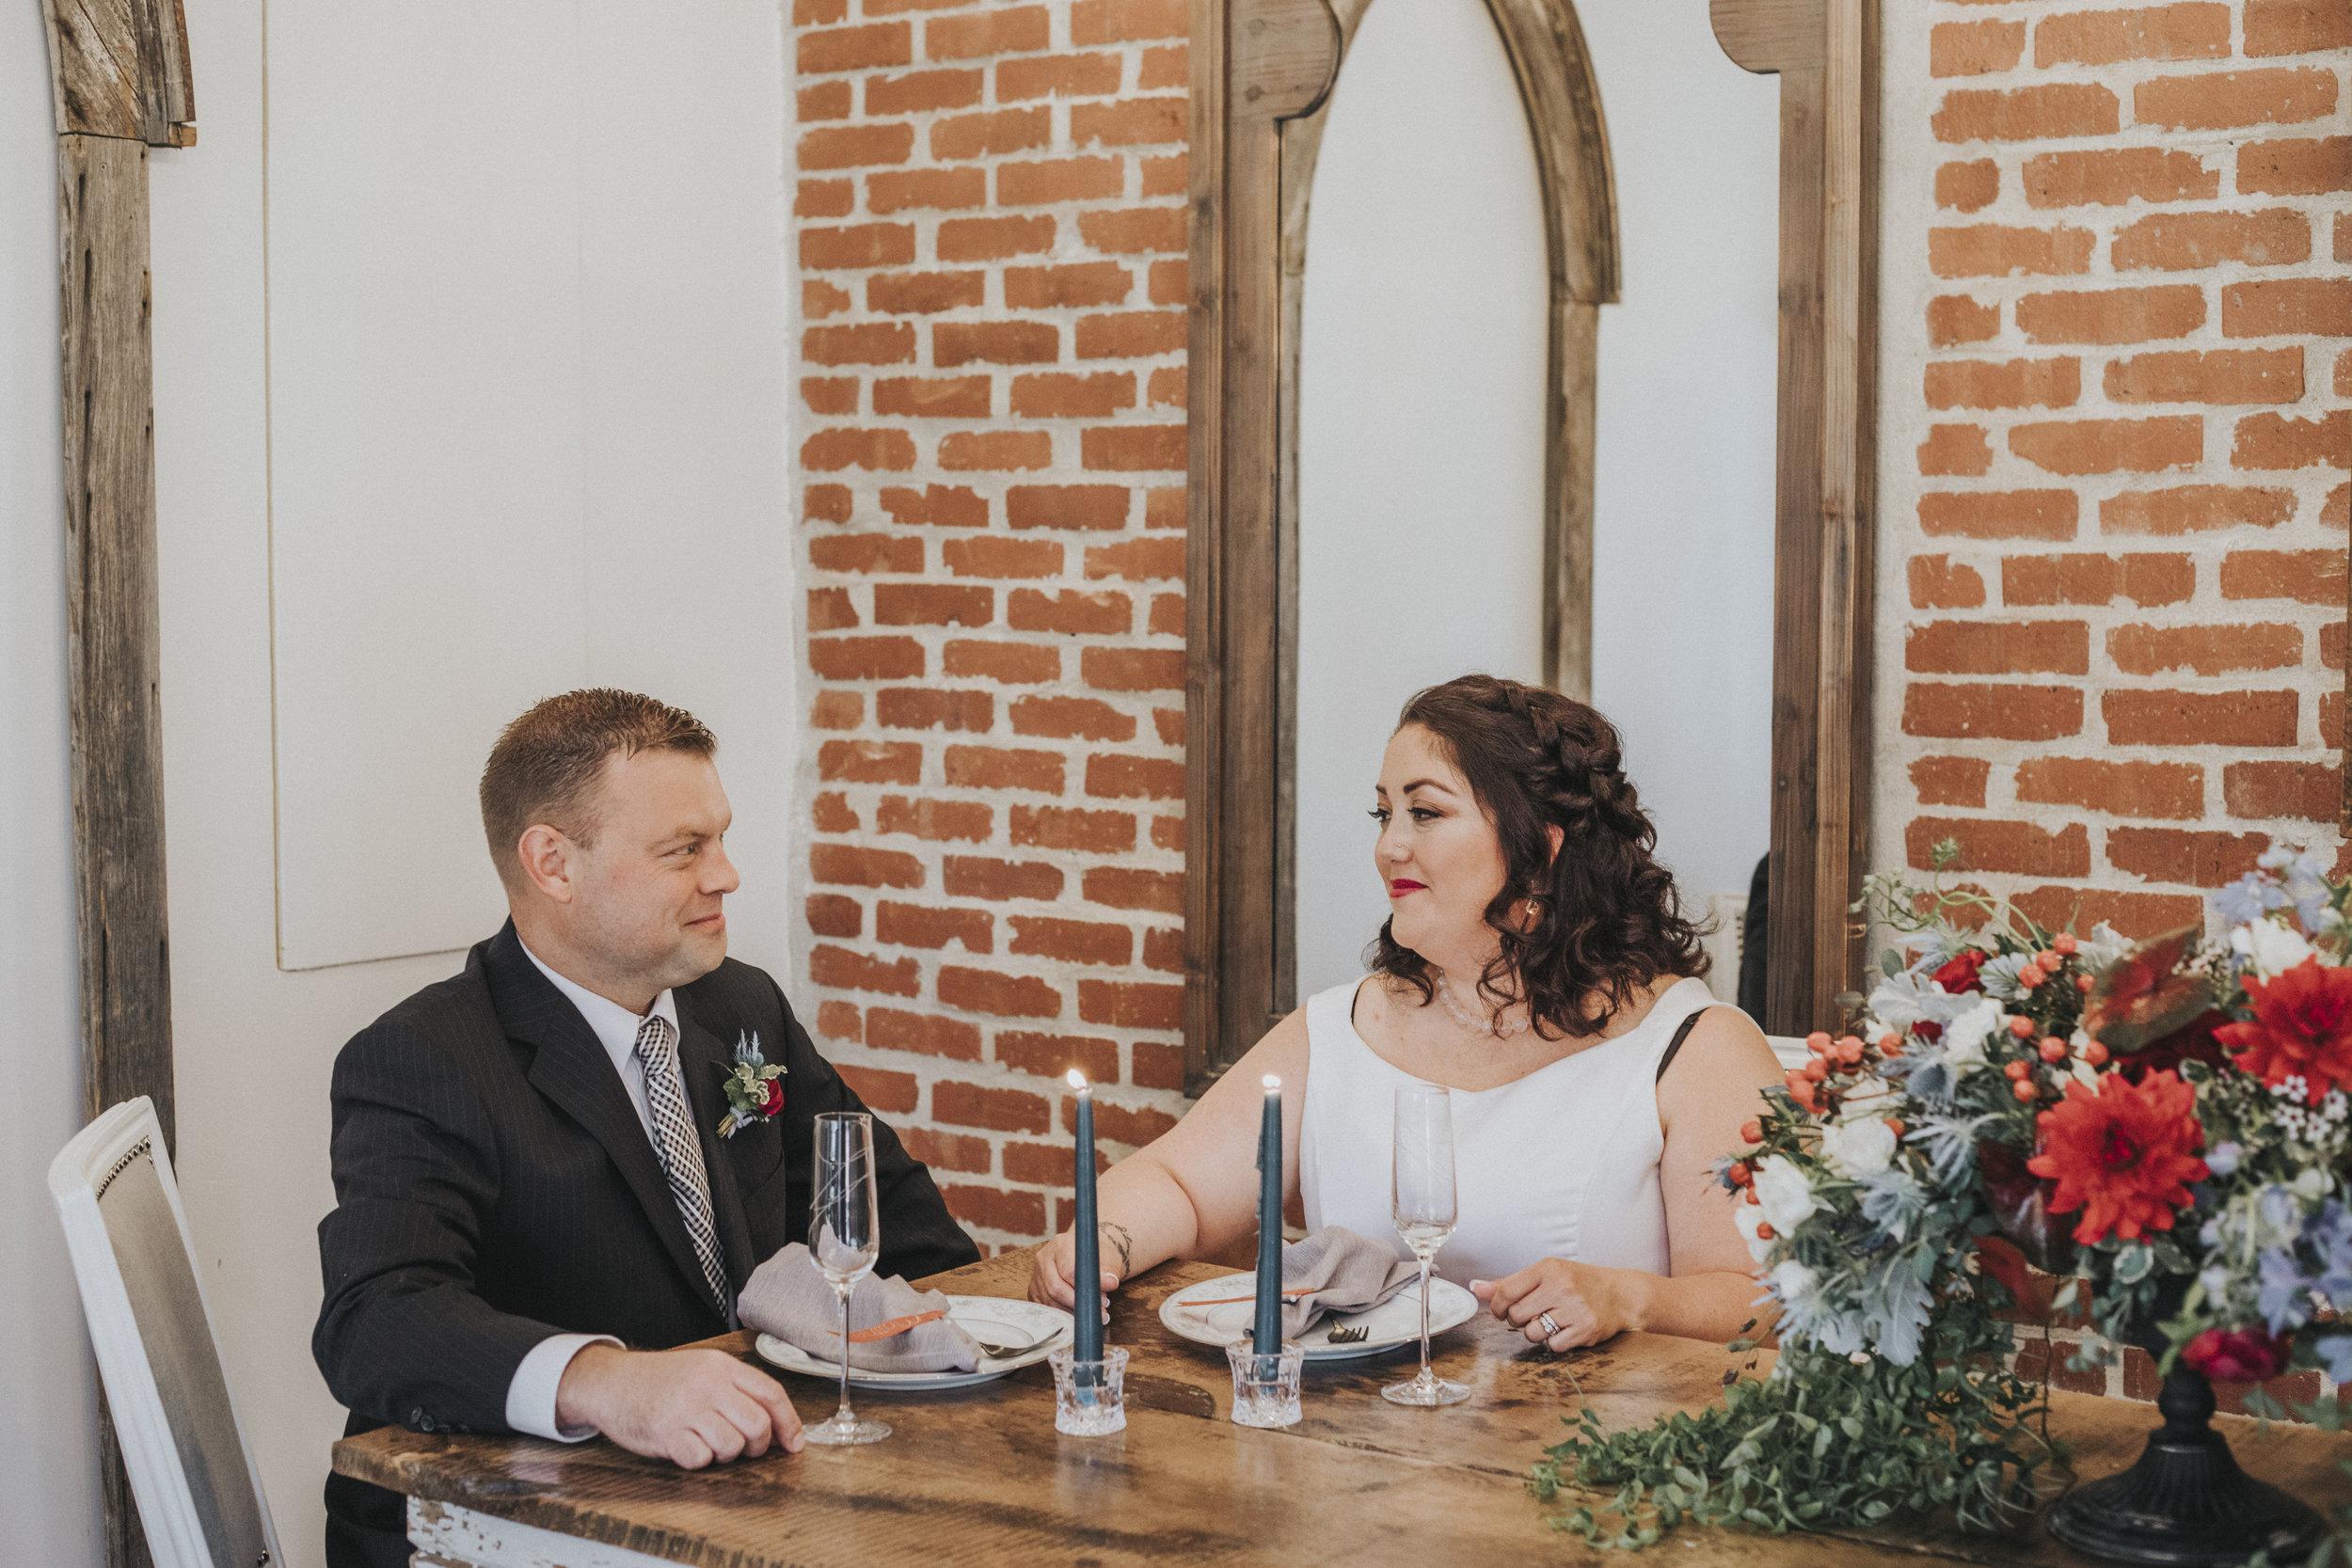 64 midwest-colorado-nebraska-elopement-photography-gretna-turtledoves.jpg